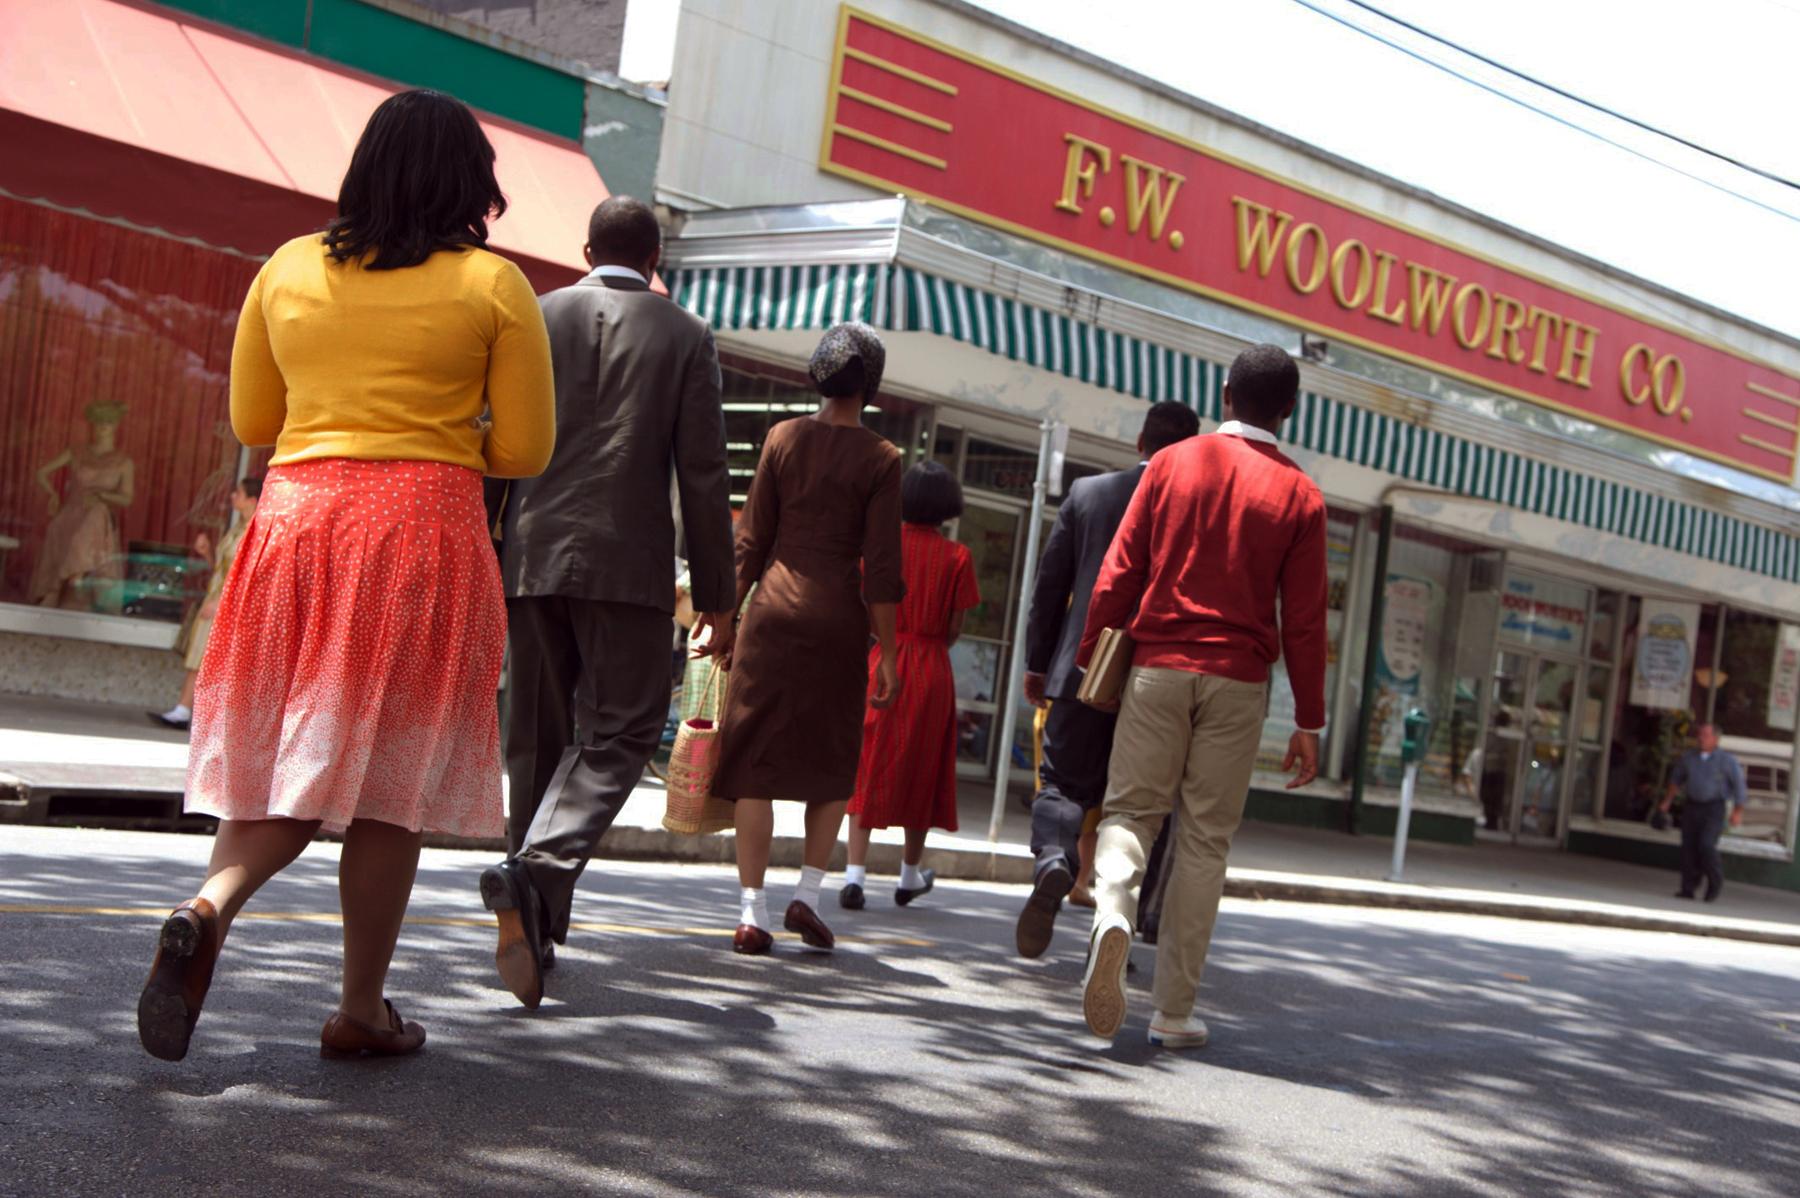 4 woolworth 1 .jpg